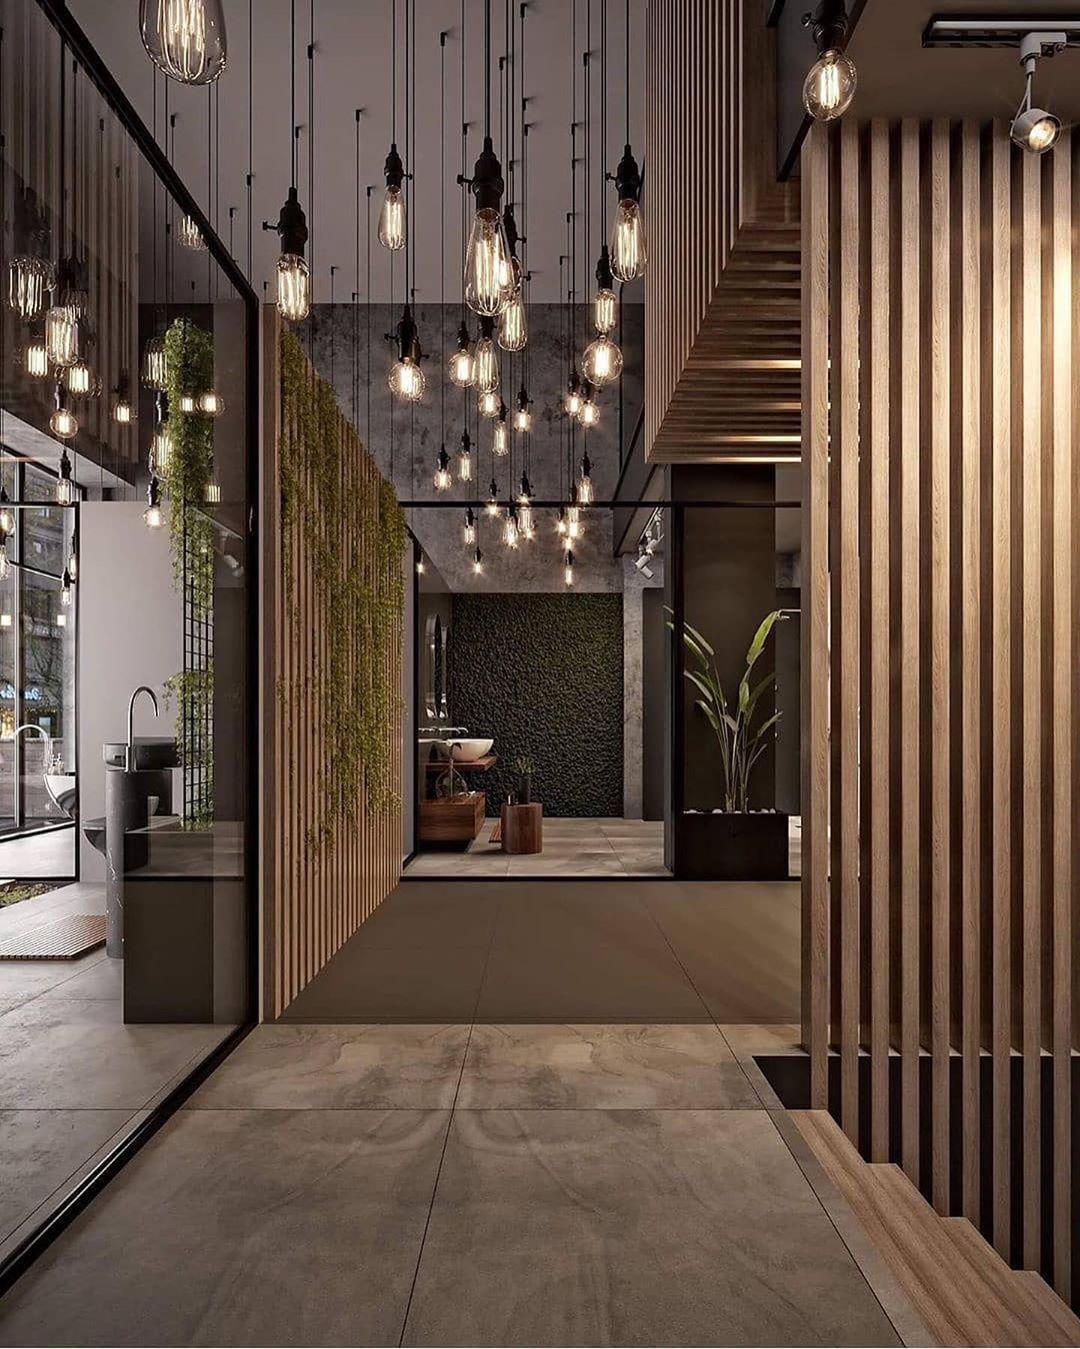 Stunning 16 Best School For Interior Design In New York Best Furniture Shop Ubud Fancy Study Interior Design Best Interior Design Blogs Interior Design Blog